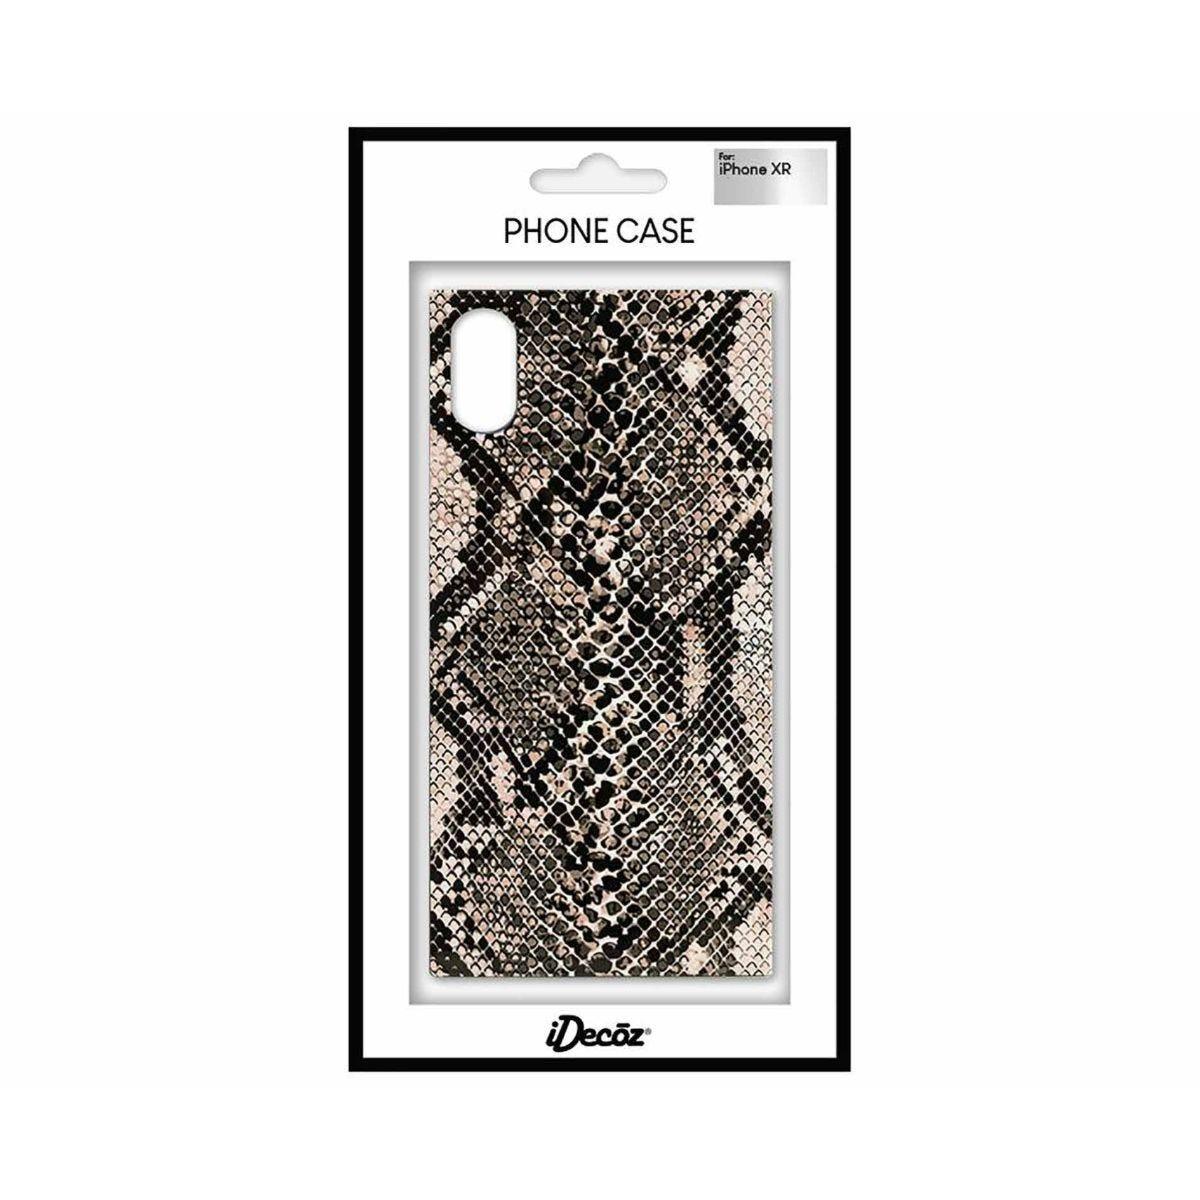 iDecoz iPhone XR Protective Case Snake Print